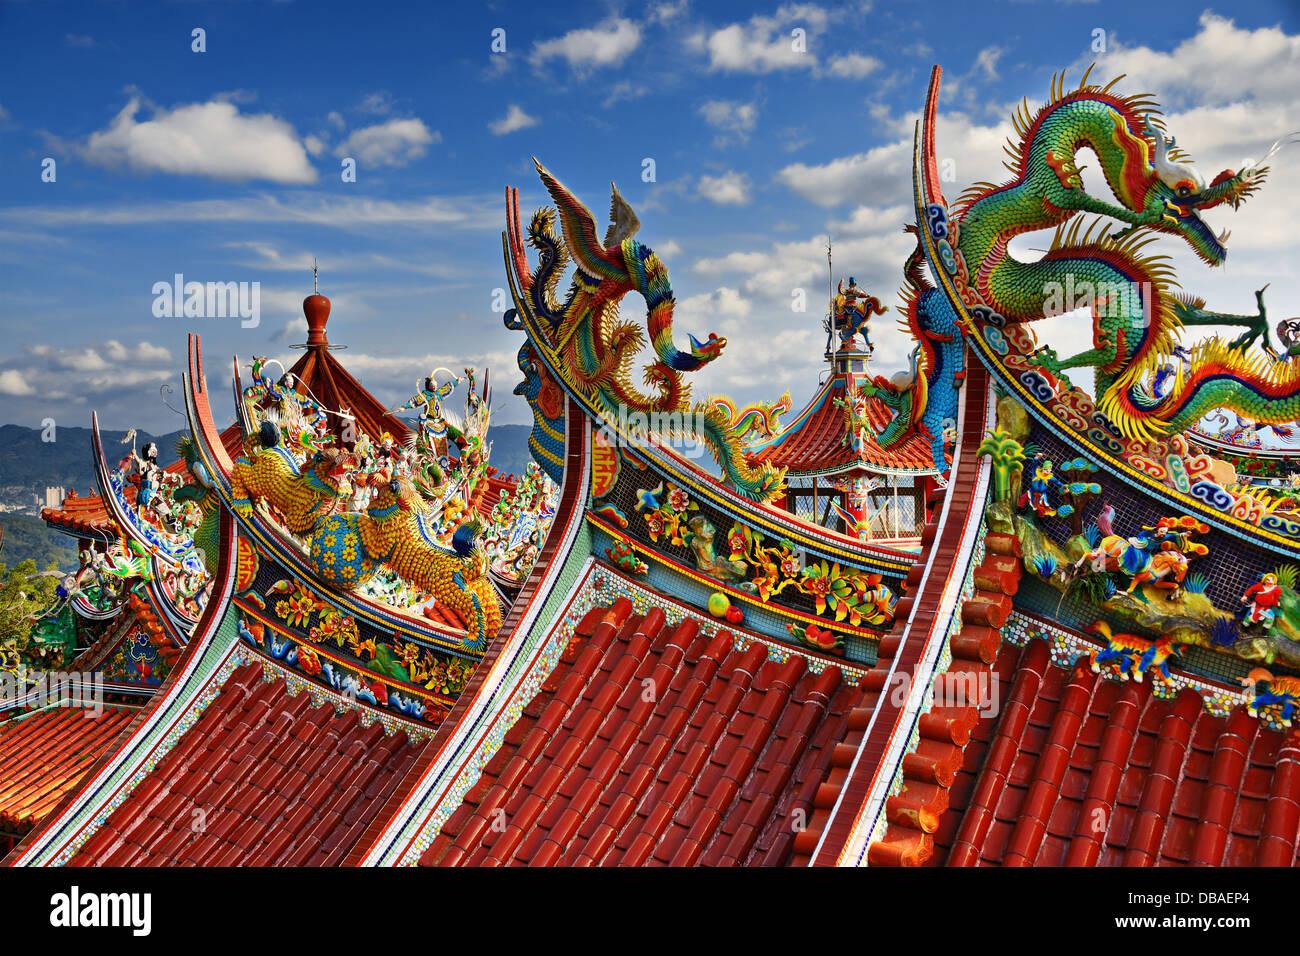 Ornano il tempio Cinese al tempio Bishan in Taipei, Taiwan. Immagini Stock